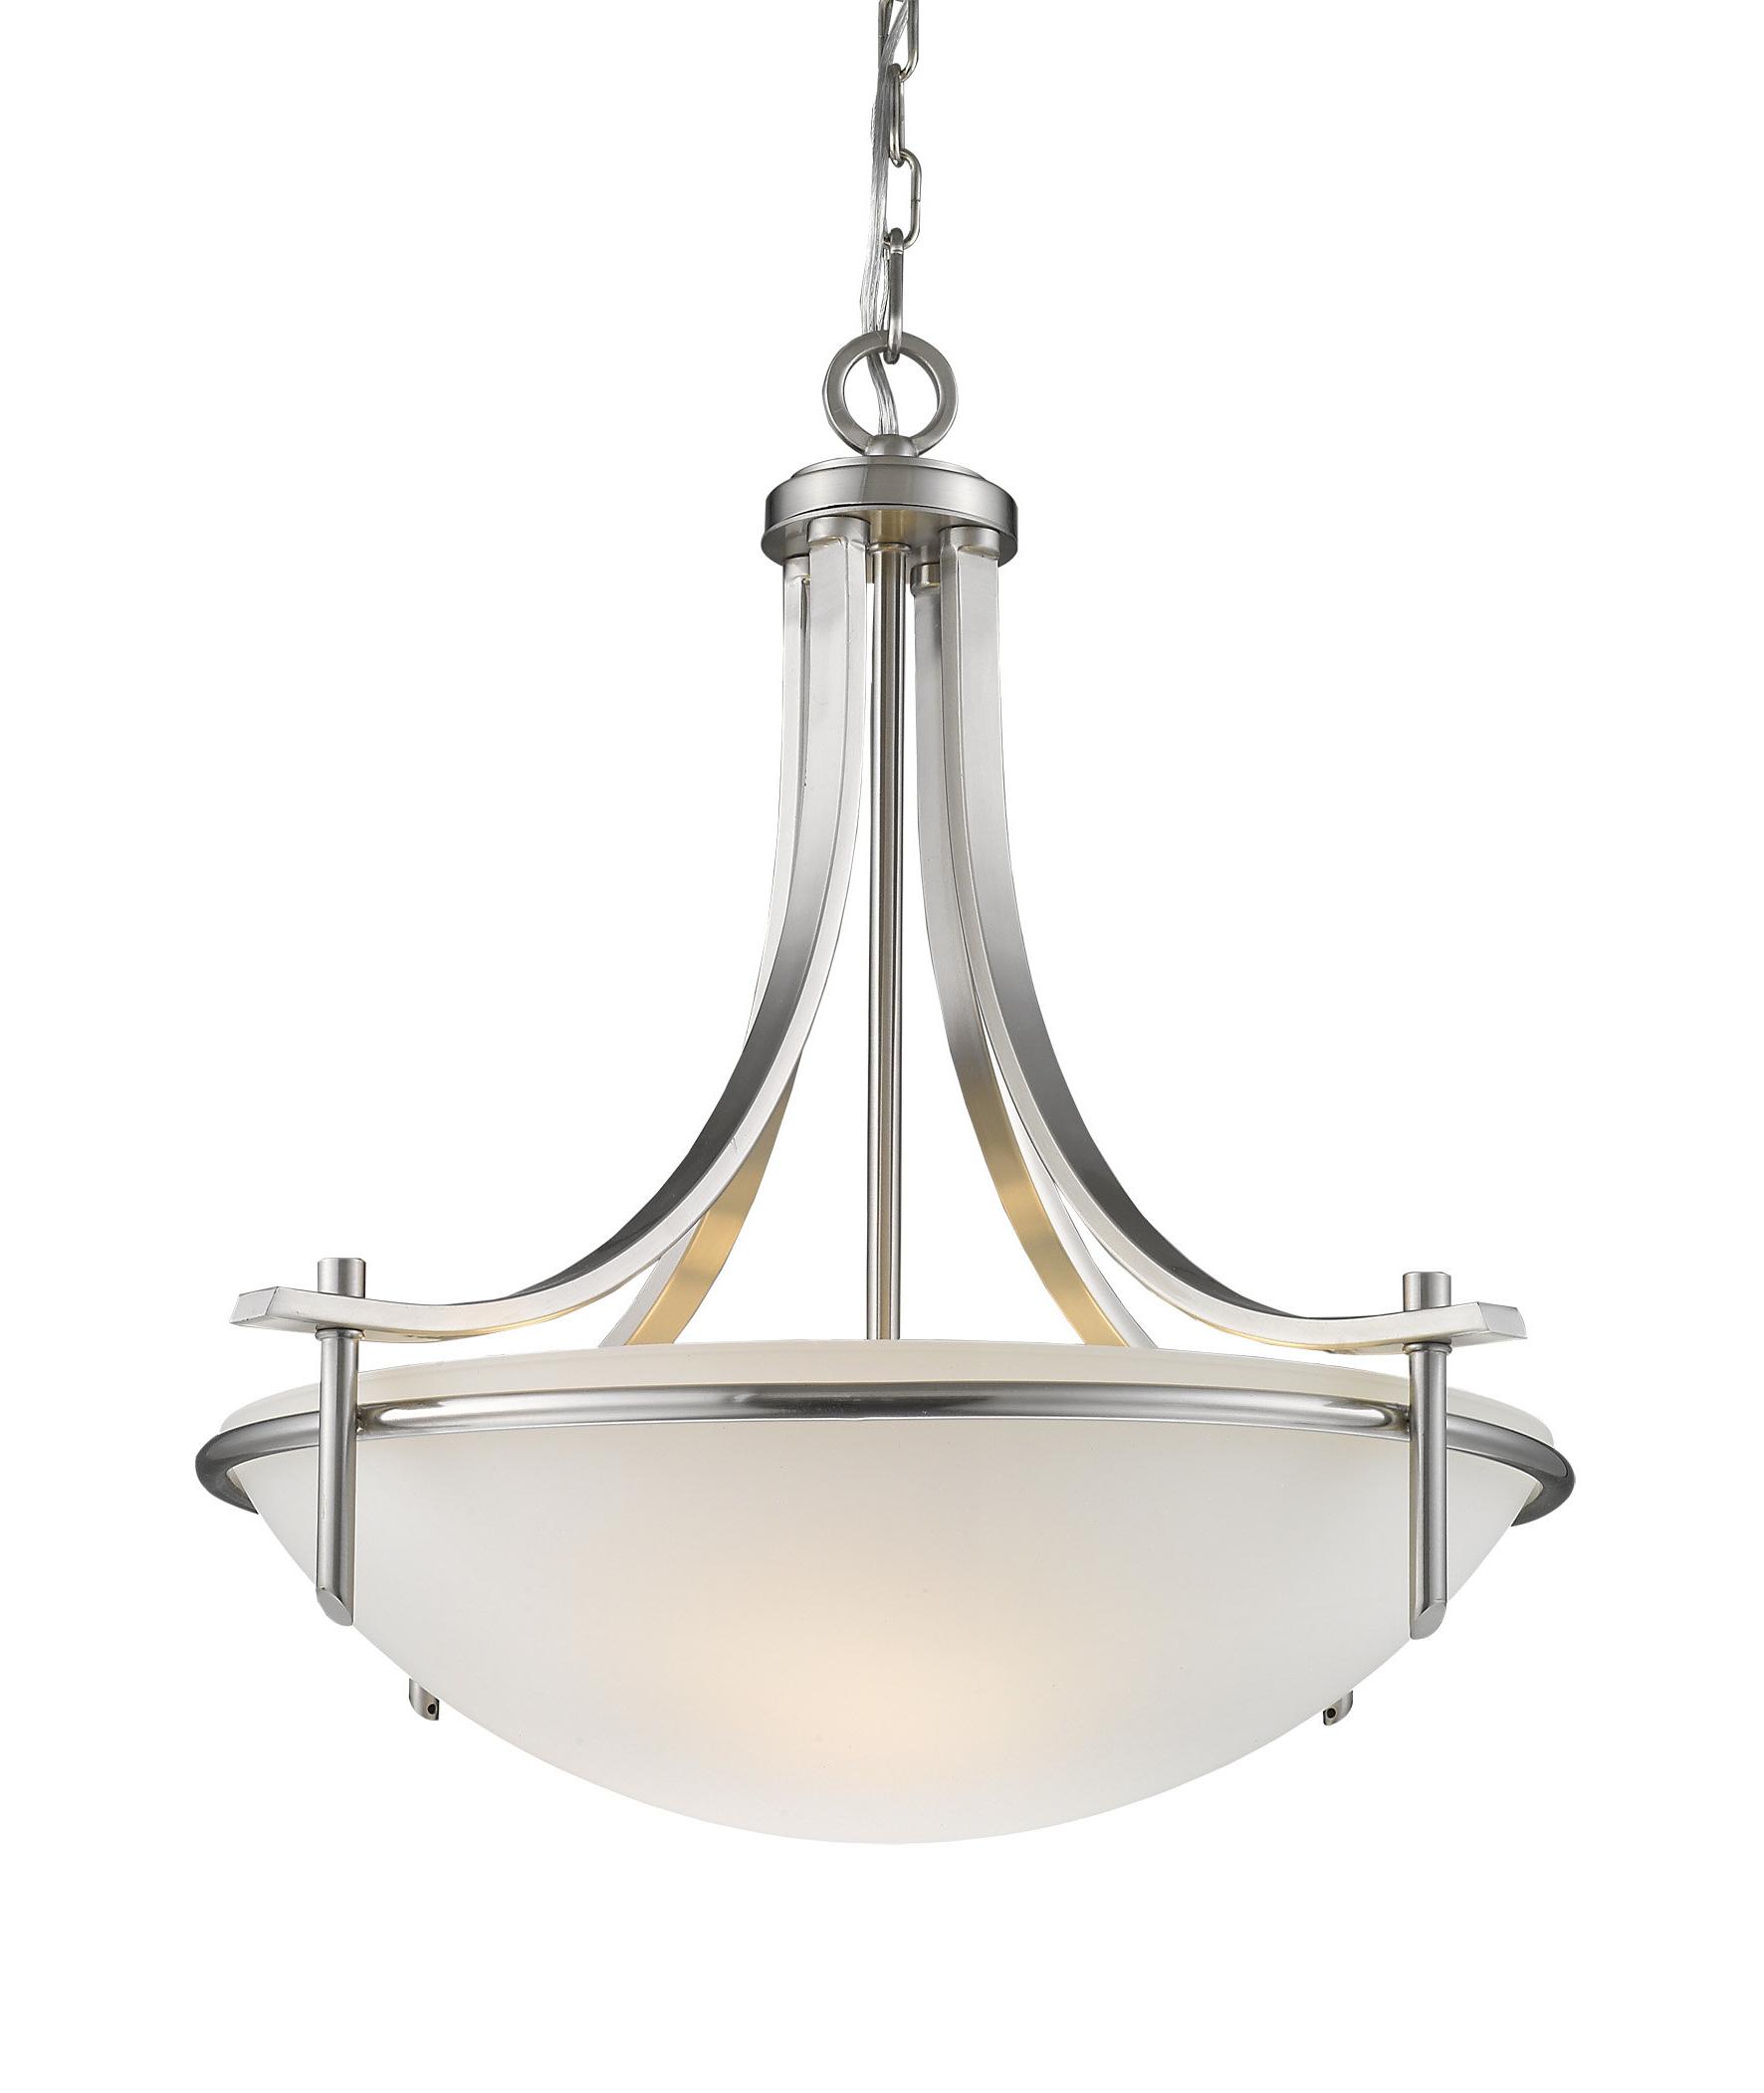 Colton 3 Light Bowl Pendant Pertaining To Fashionable Newent 3 Light Single Bowl Pendants (View 7 of 25)